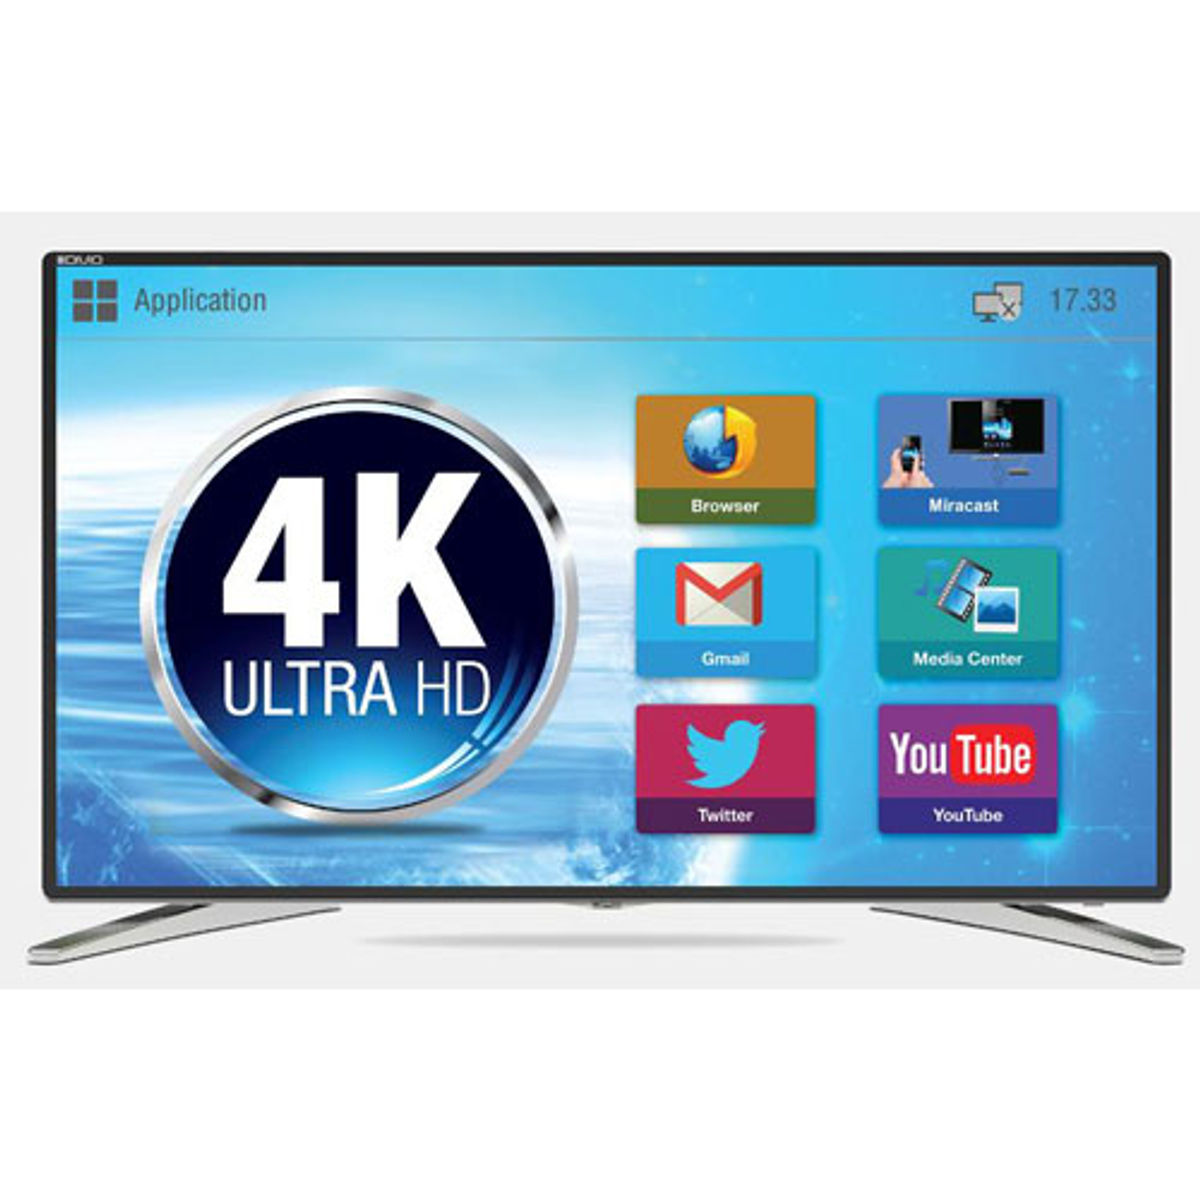 Mitashi MiDE055v22 FS 55 inch Ultra HD 4K Smart LED TV